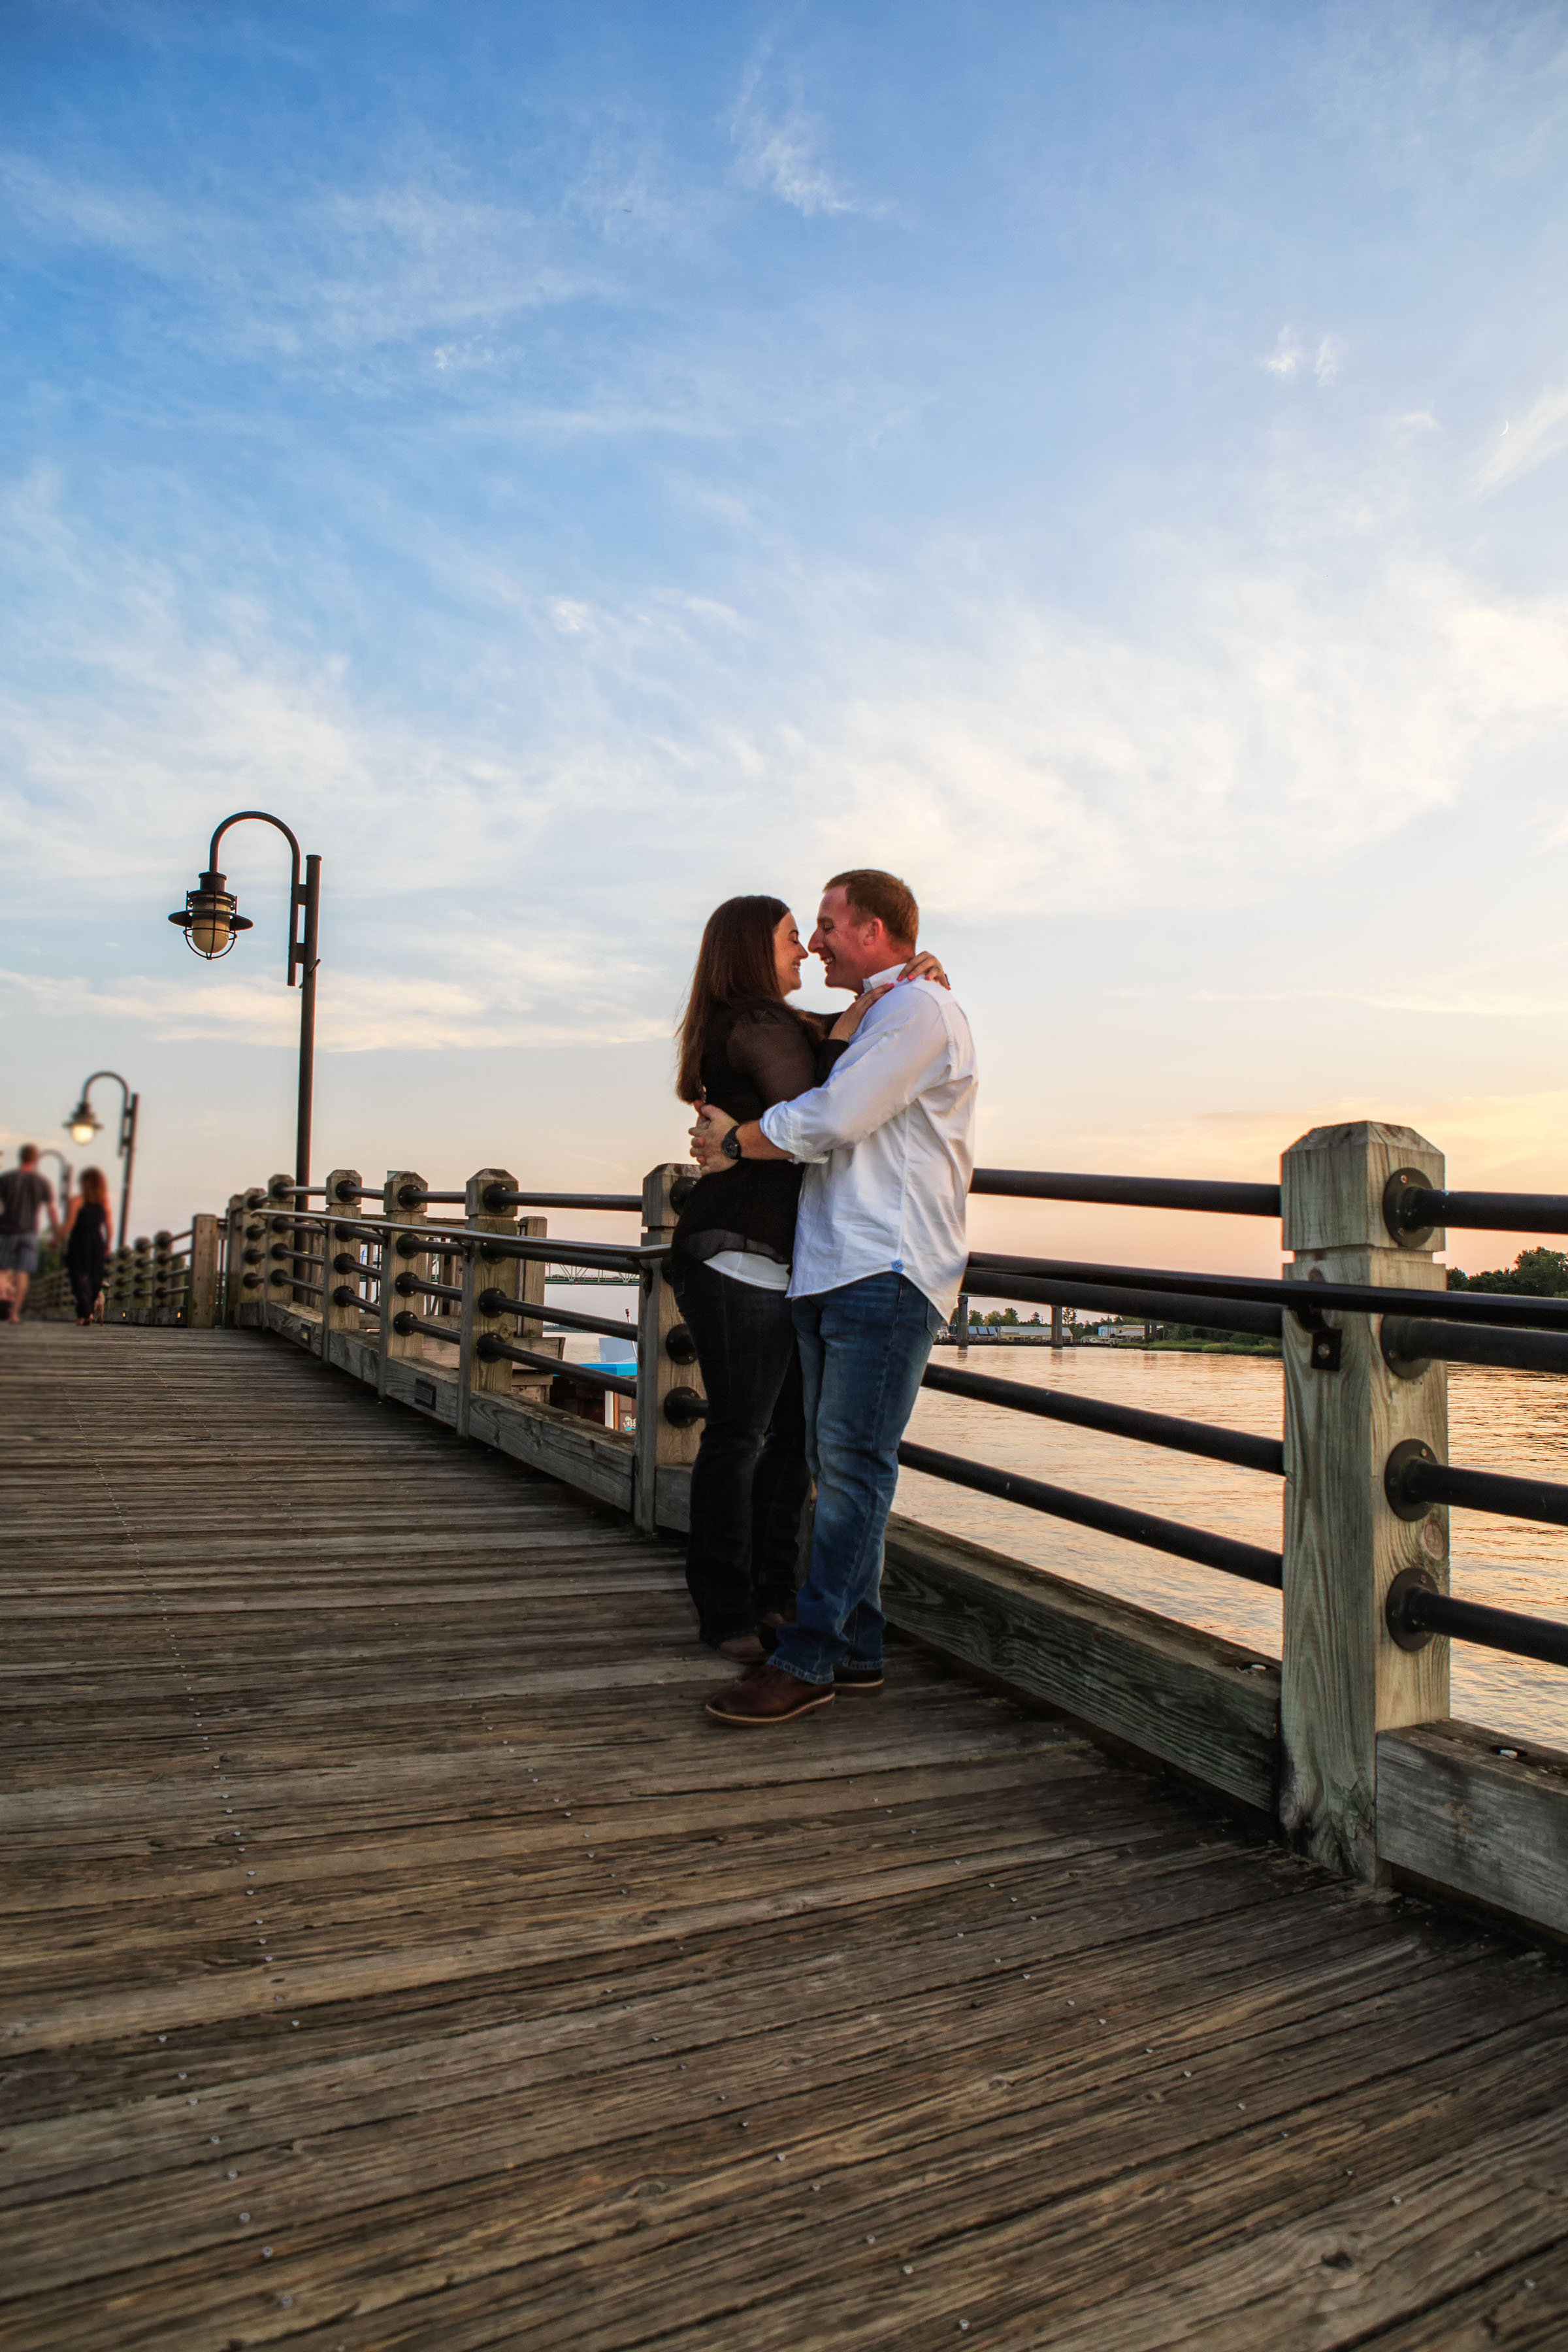 Wilmington_NC_Photographer_Tiffany_Abruzzo_Photography_Engagement_39.jpg